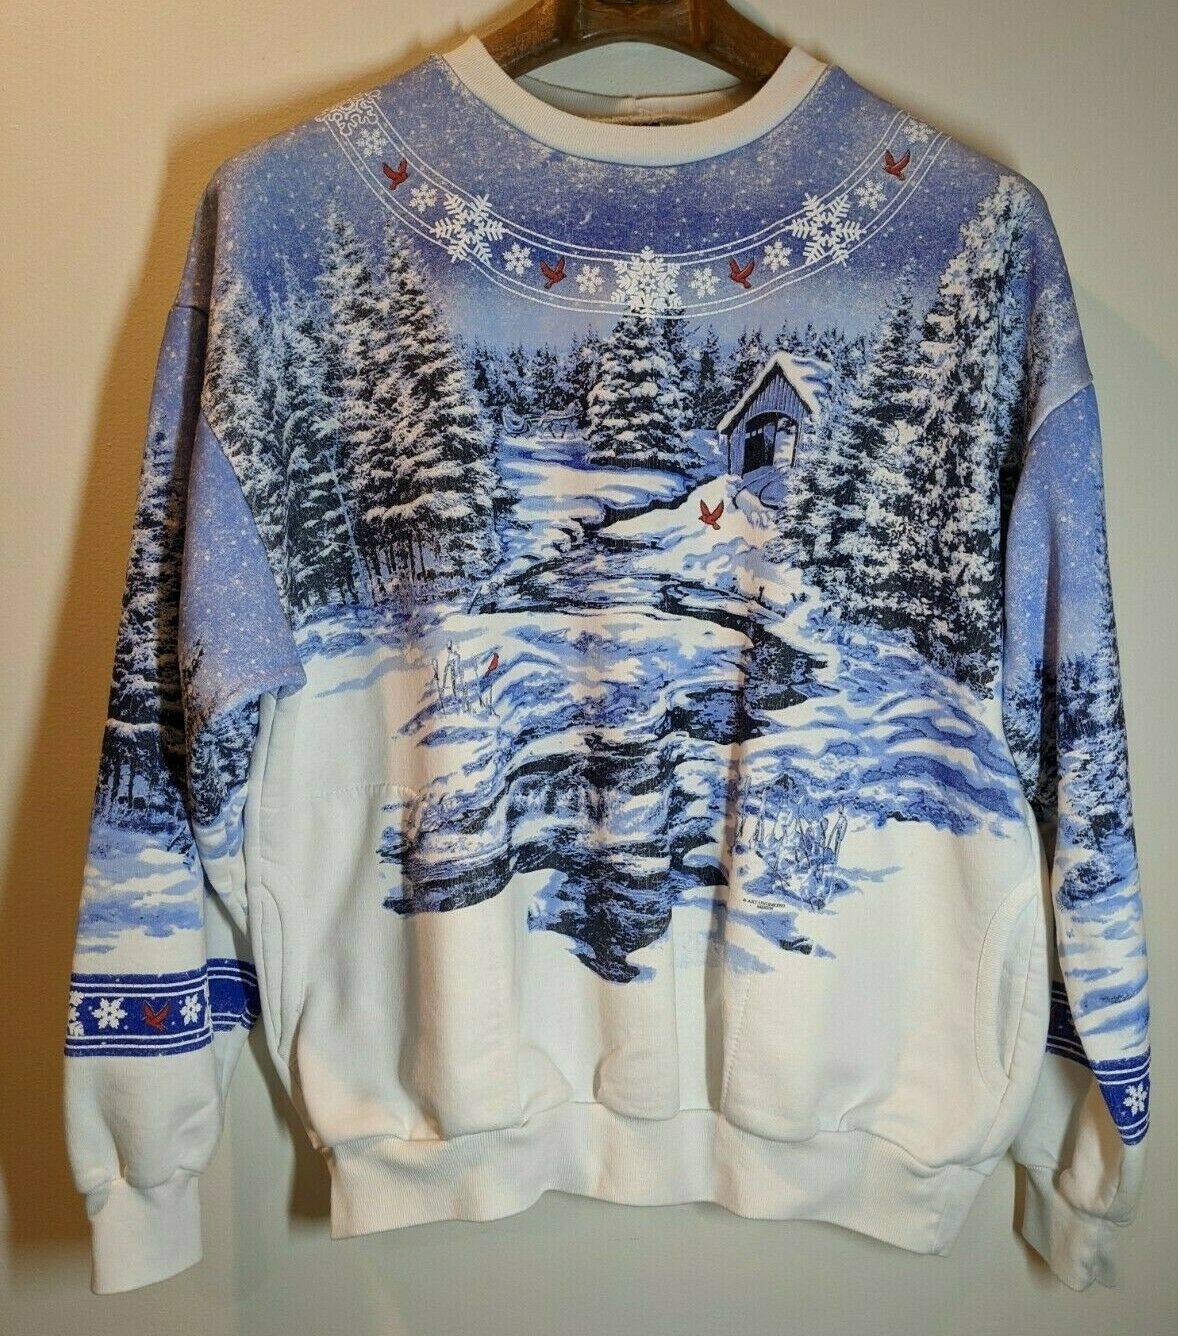 Vintage Art Unlimited Winter Wonderland All Over Print Sweatshirt Size X-Large